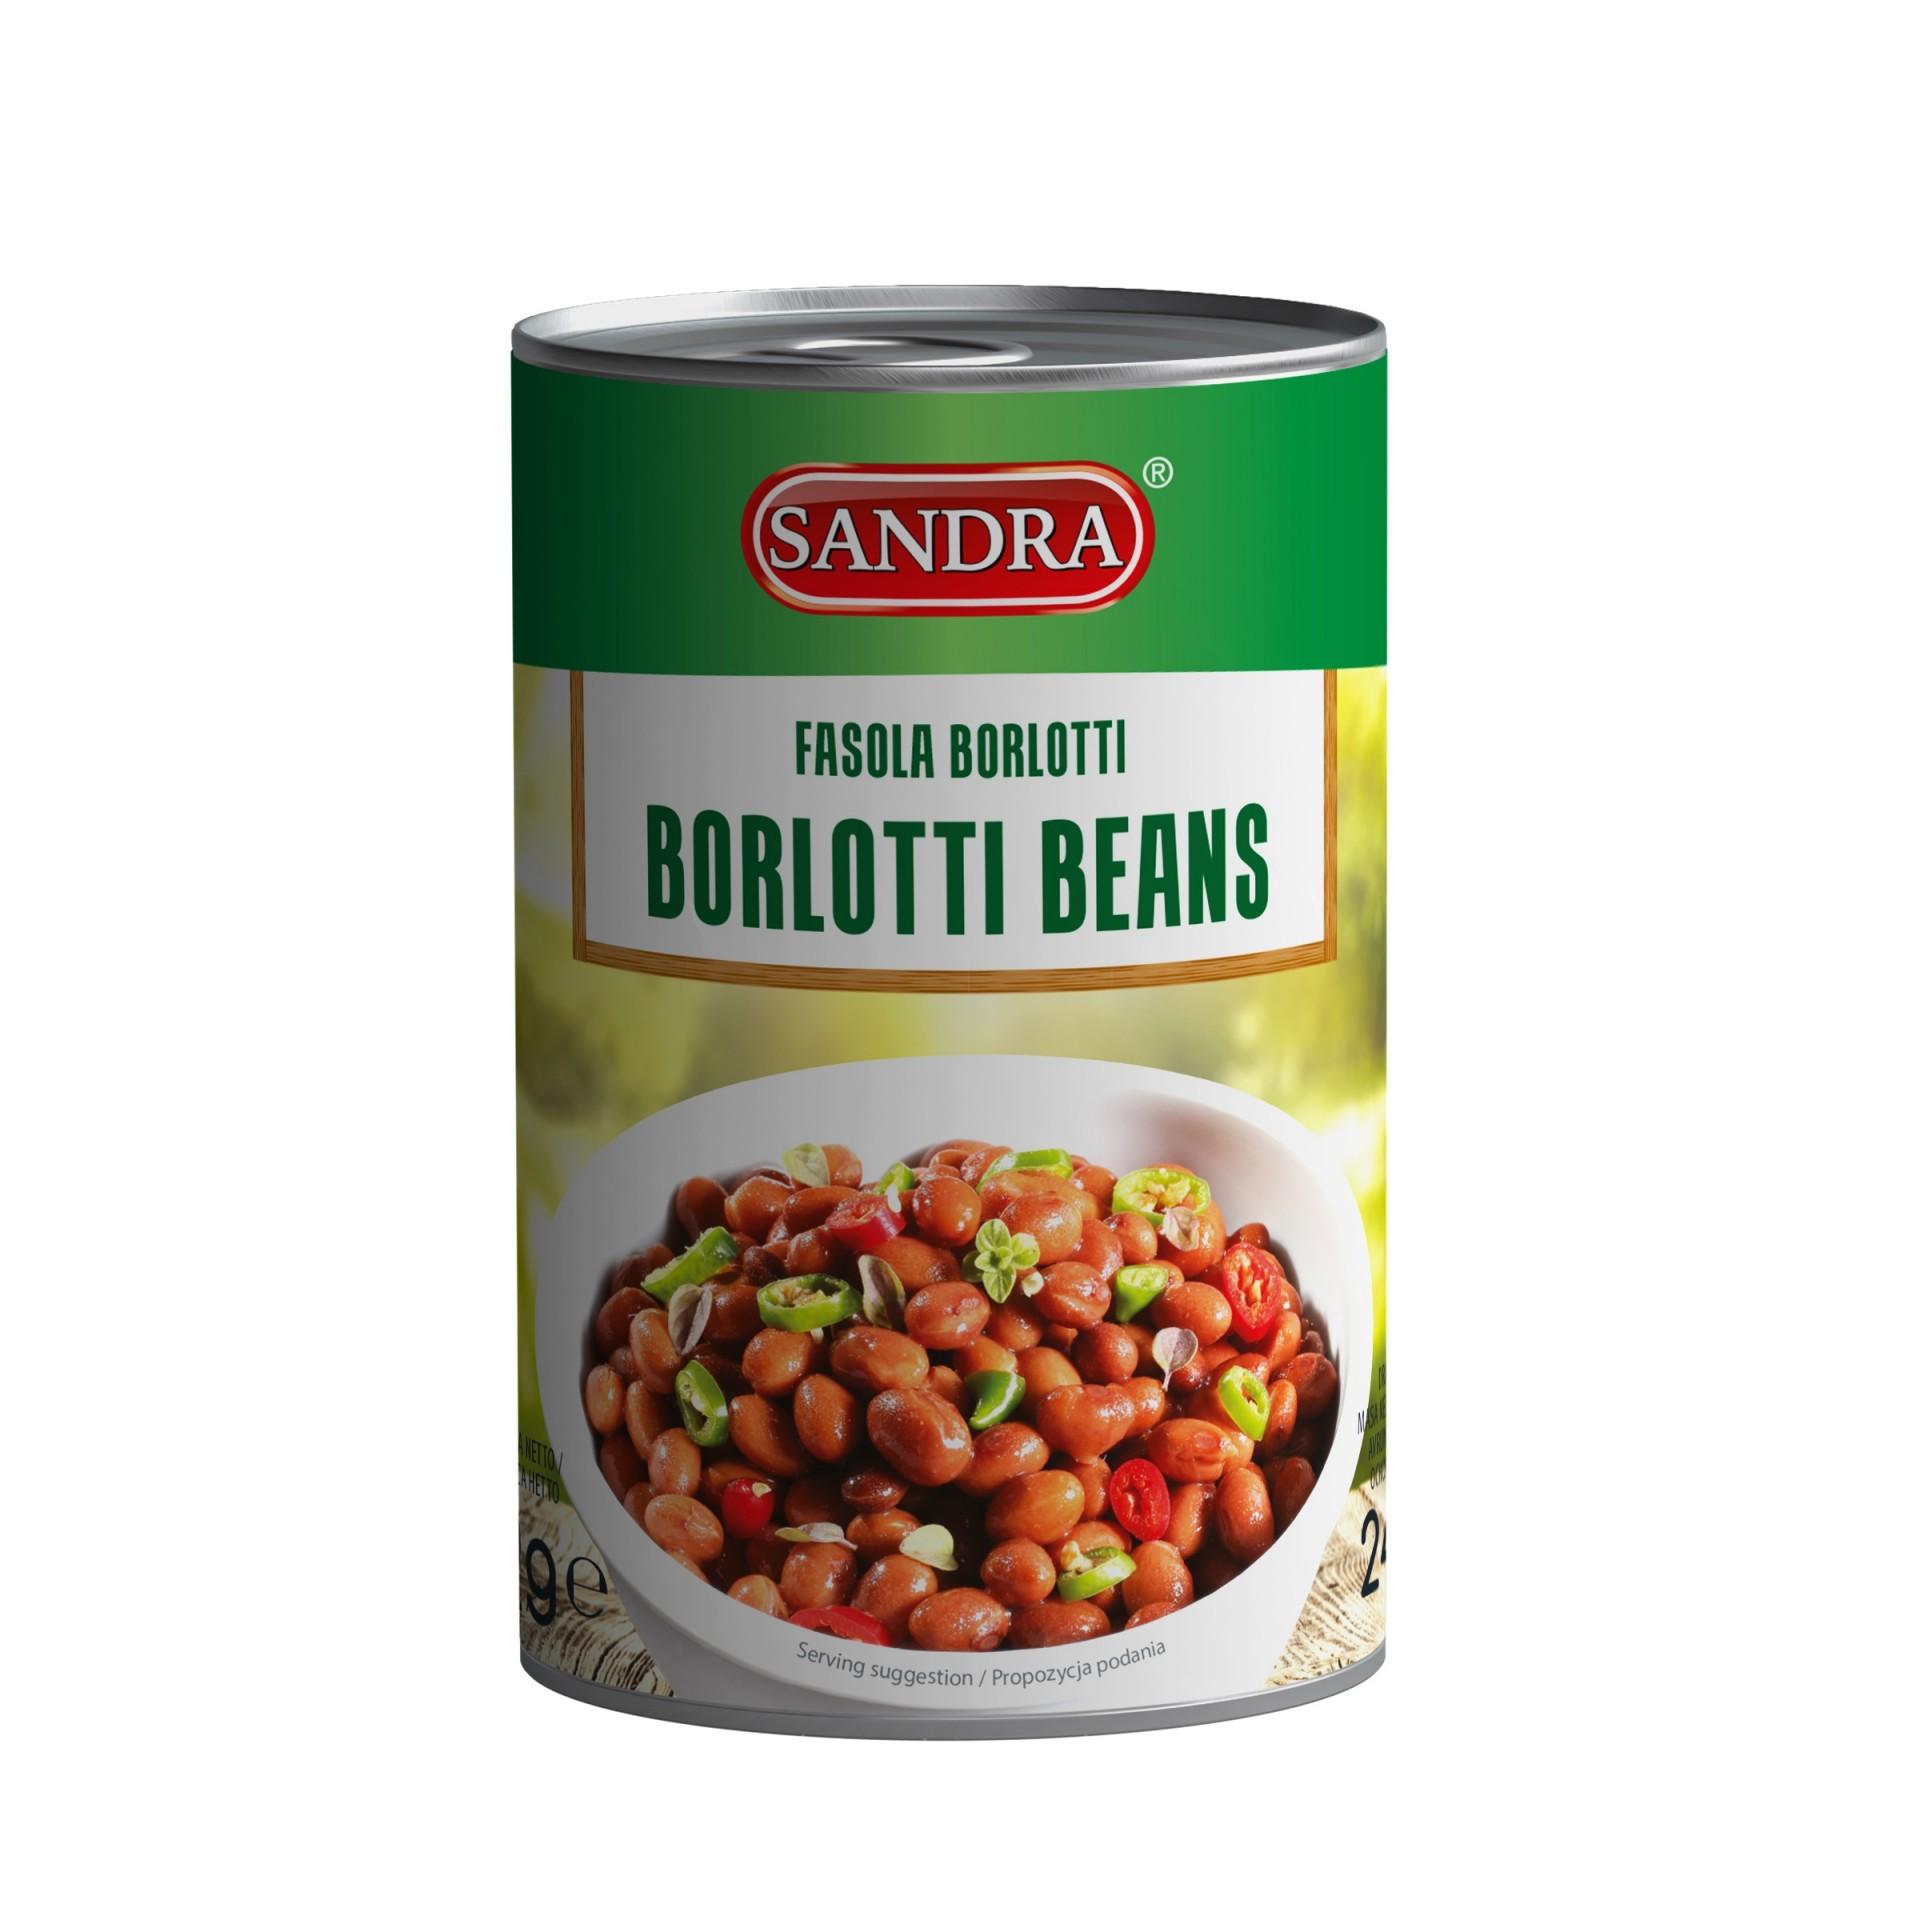 Sandra-Fasola-Borlotti-425-F12